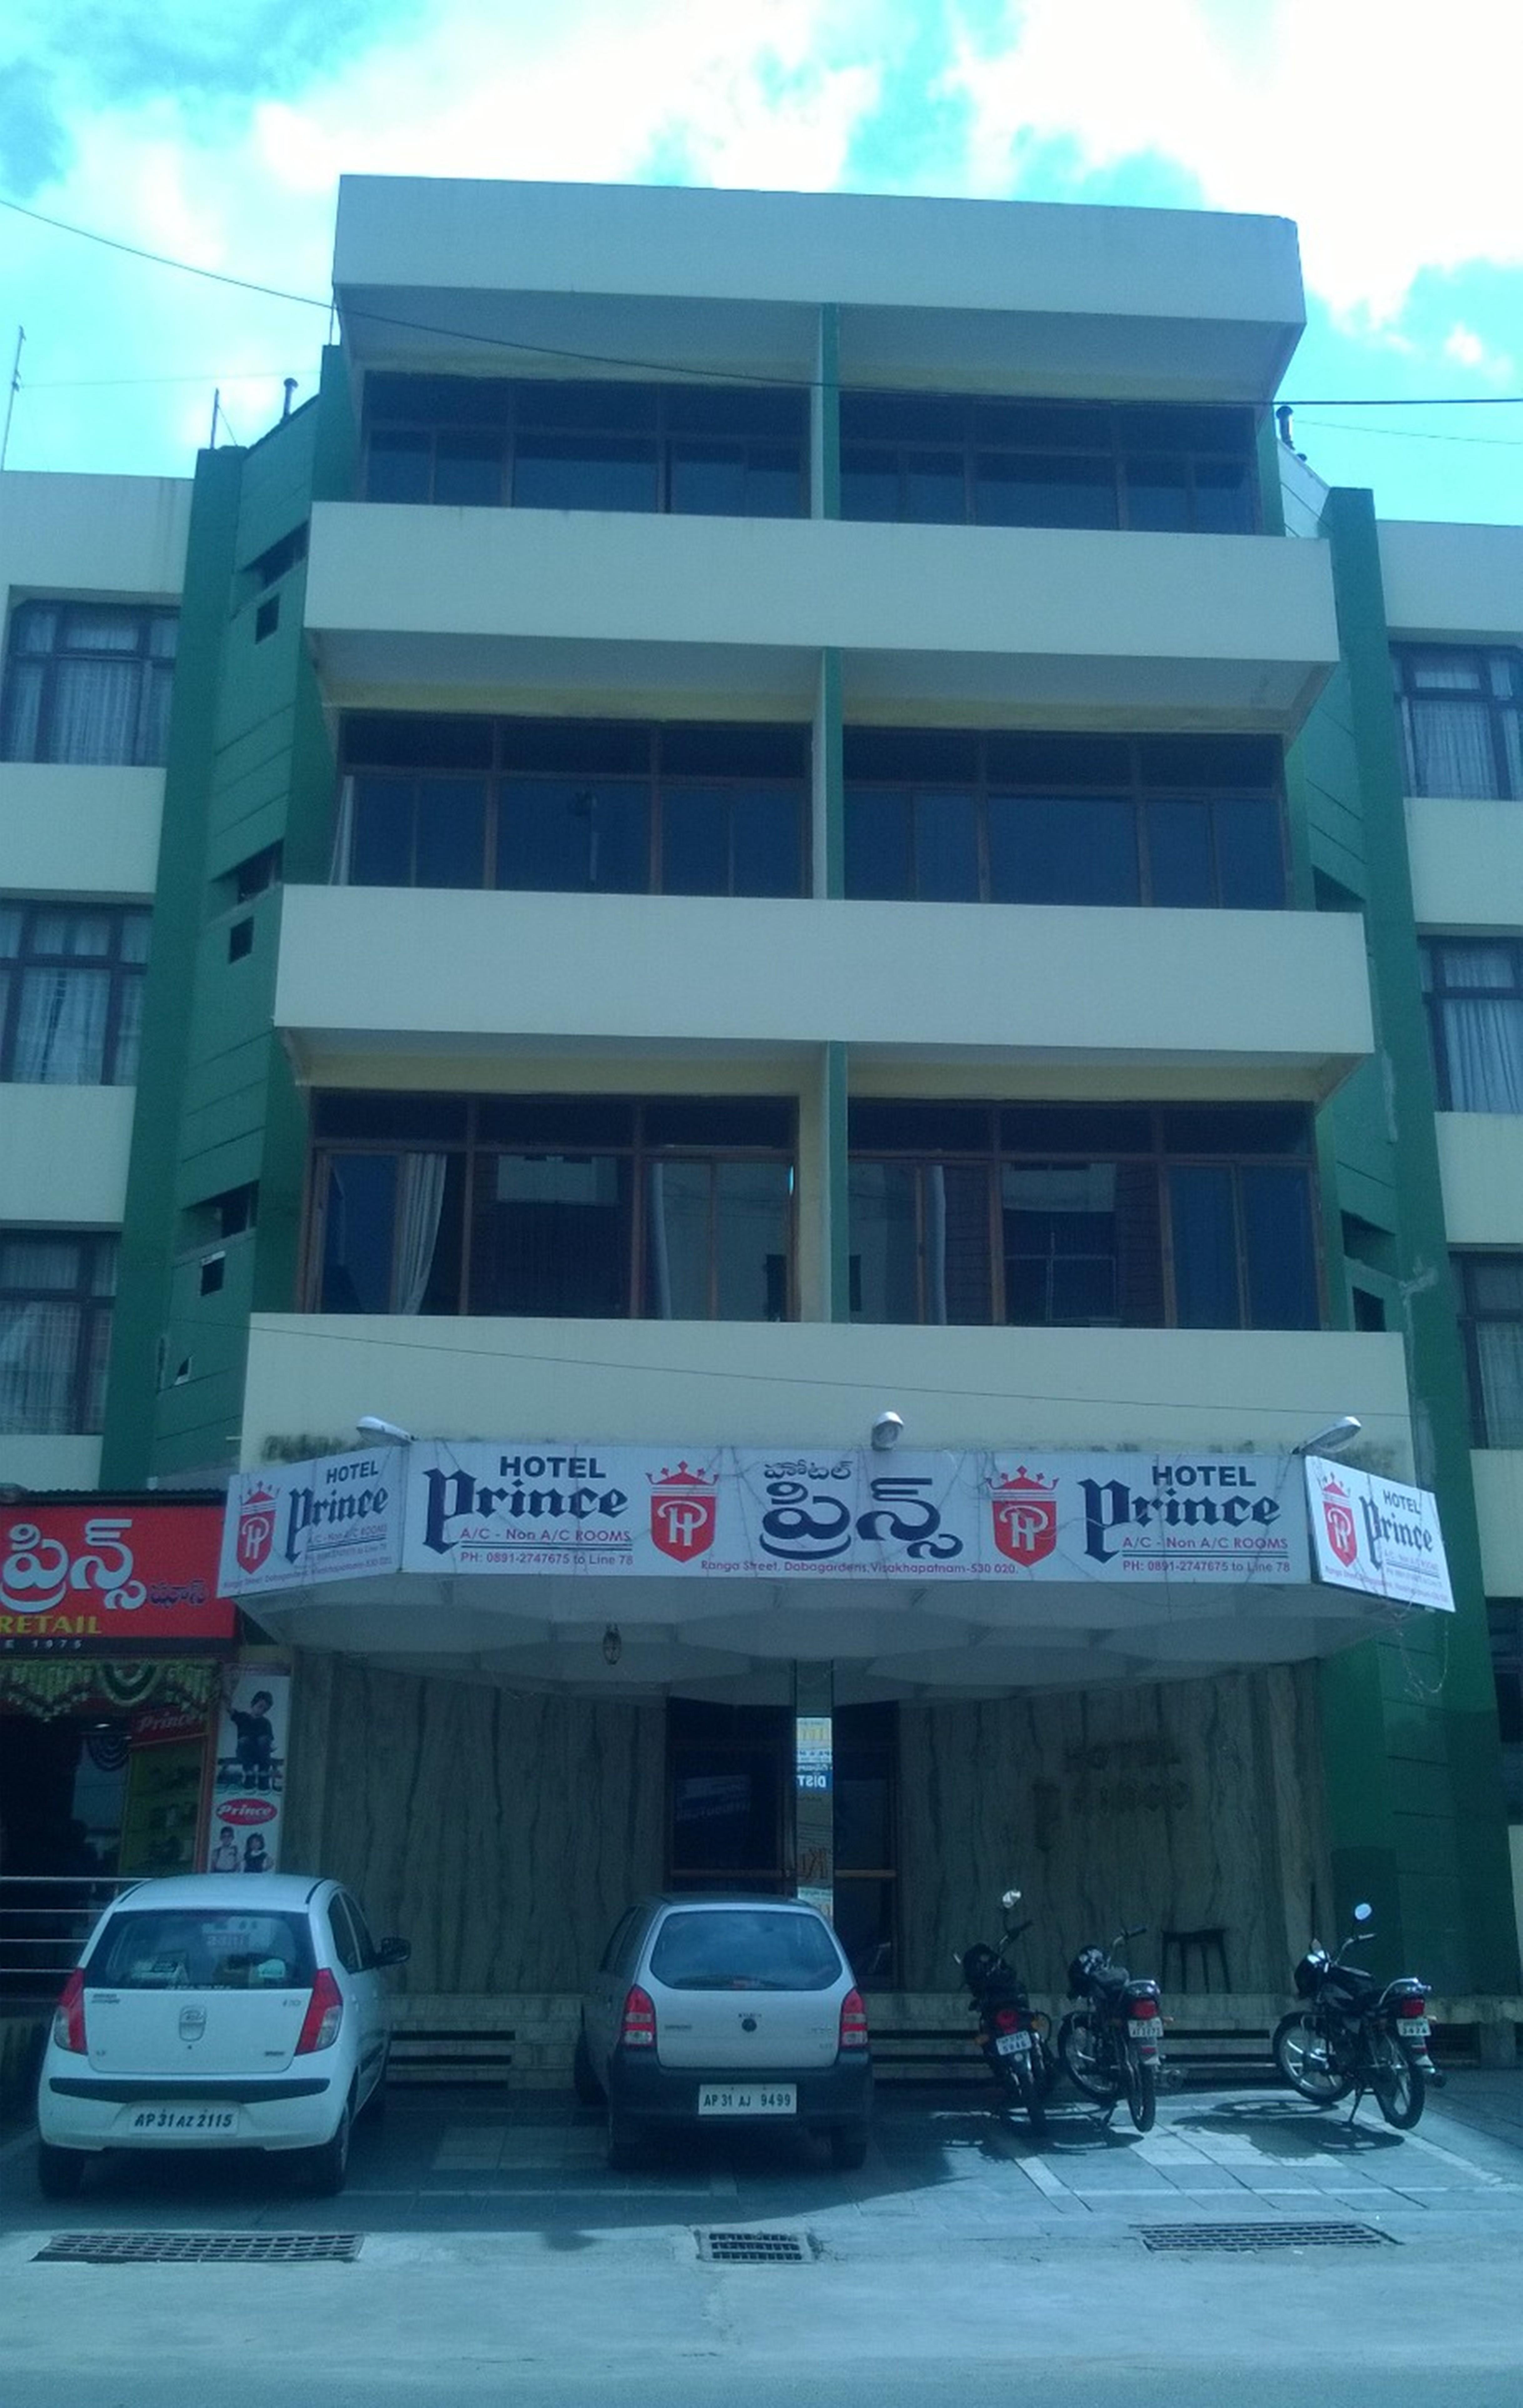 Prince Hotel in Vishakhapatnam